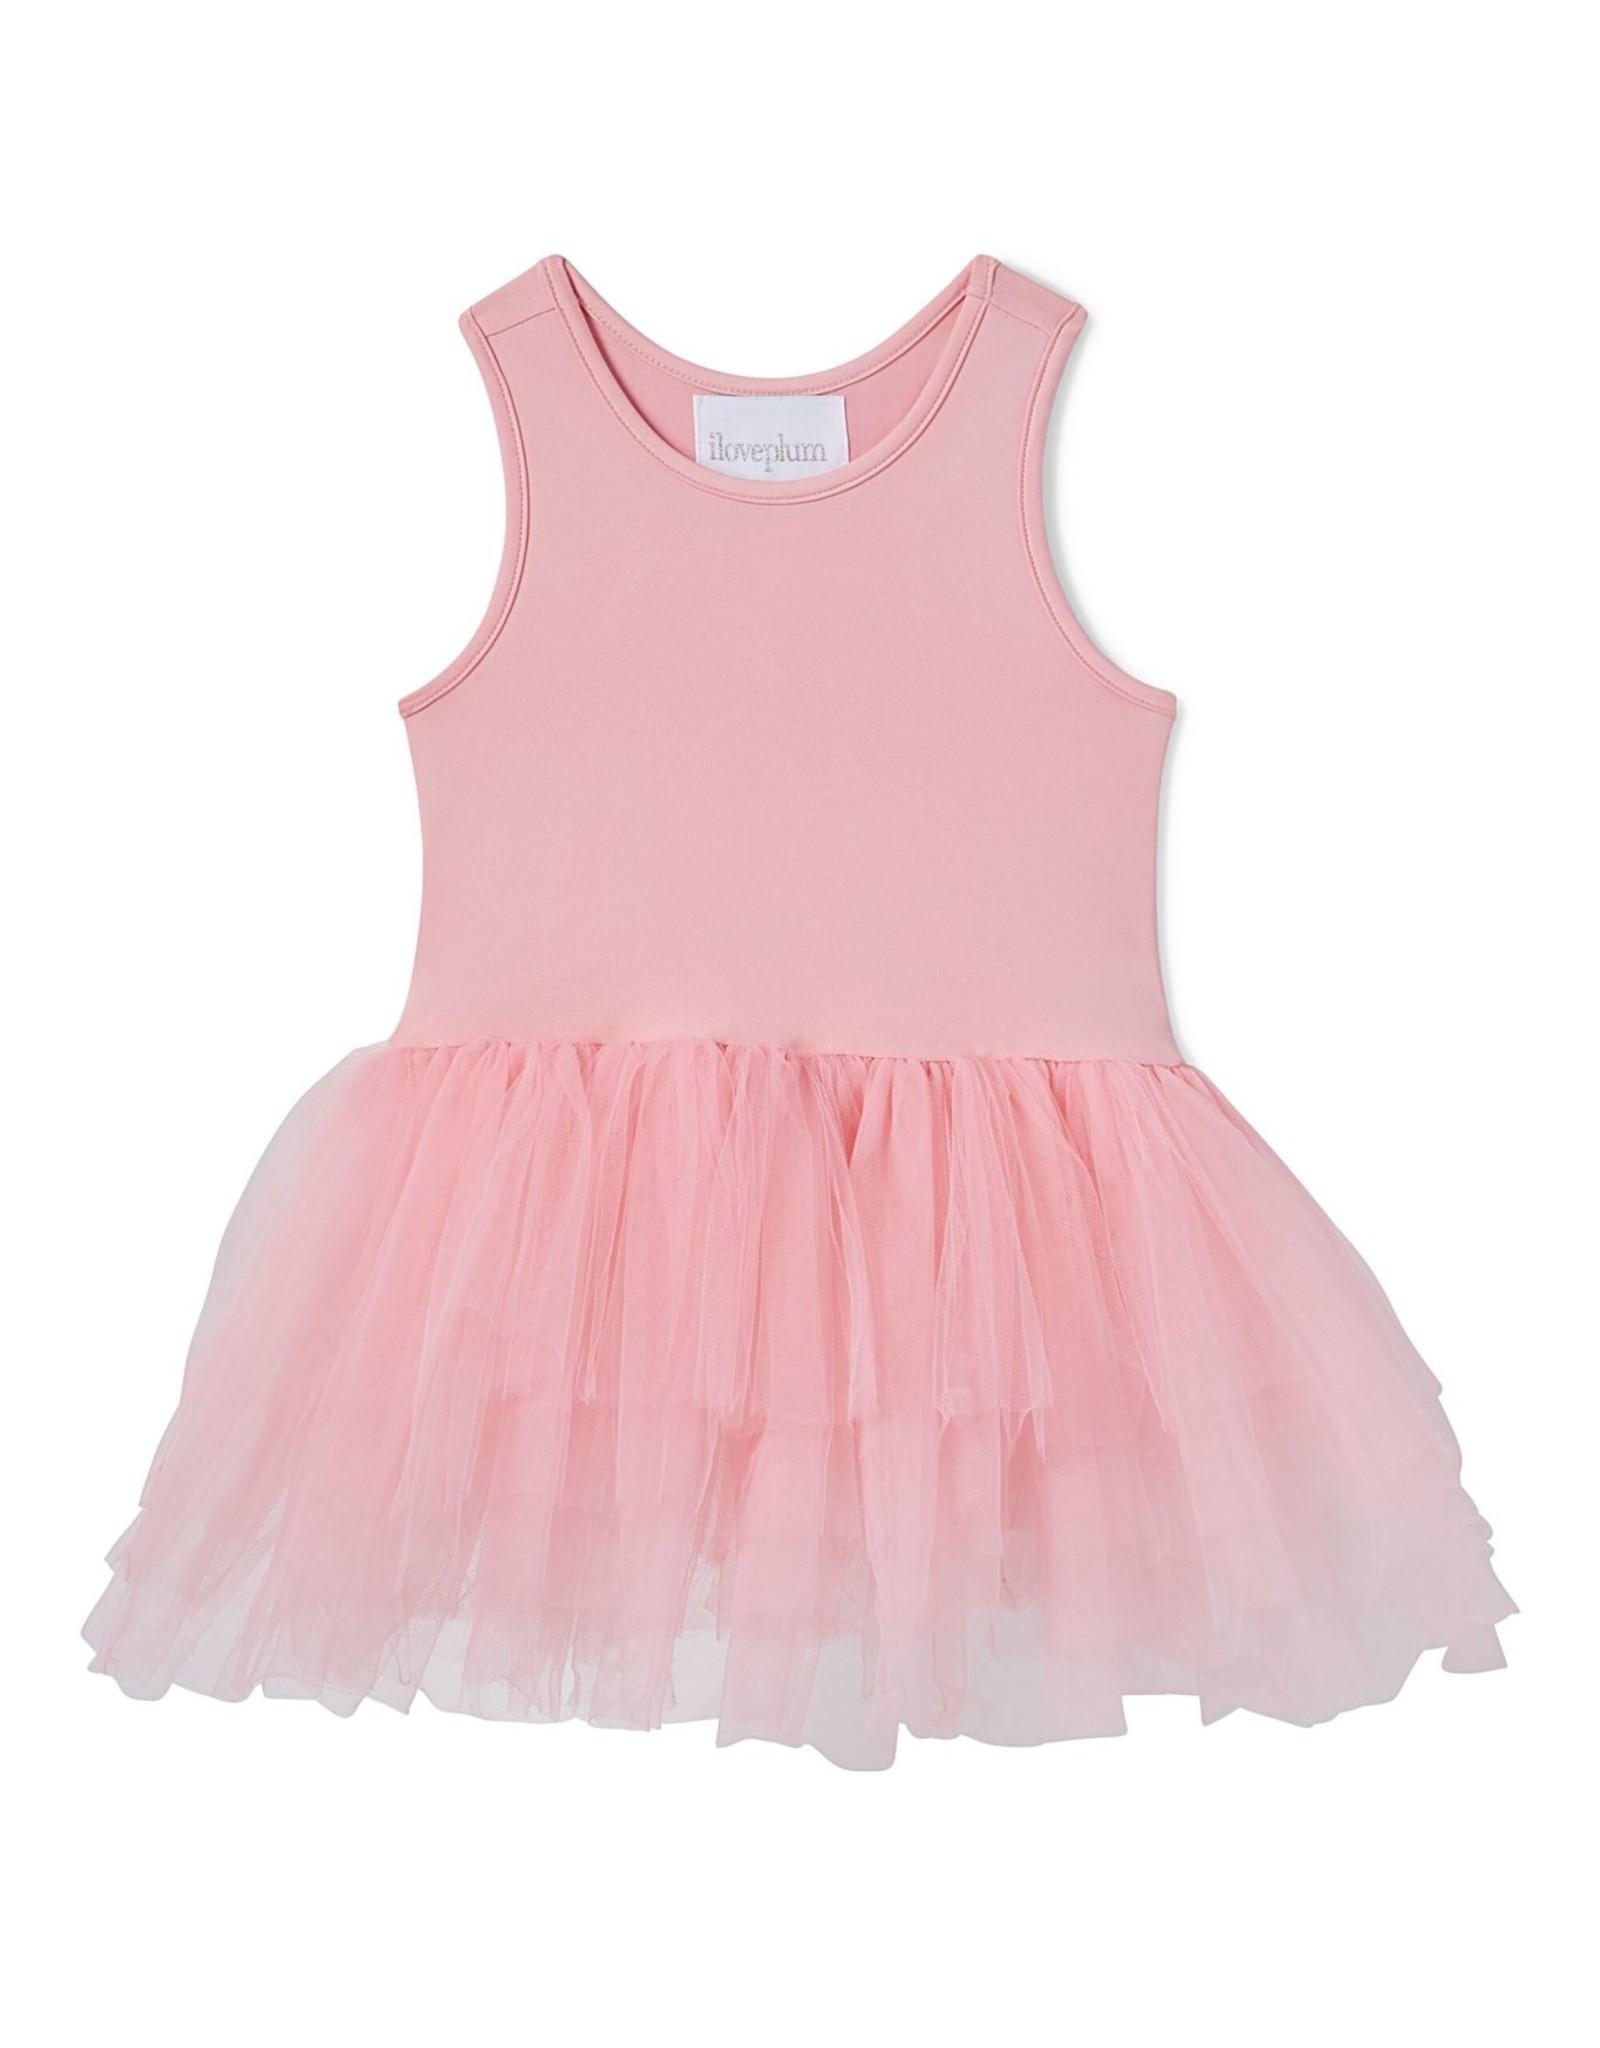 iloveplum penelope- pink